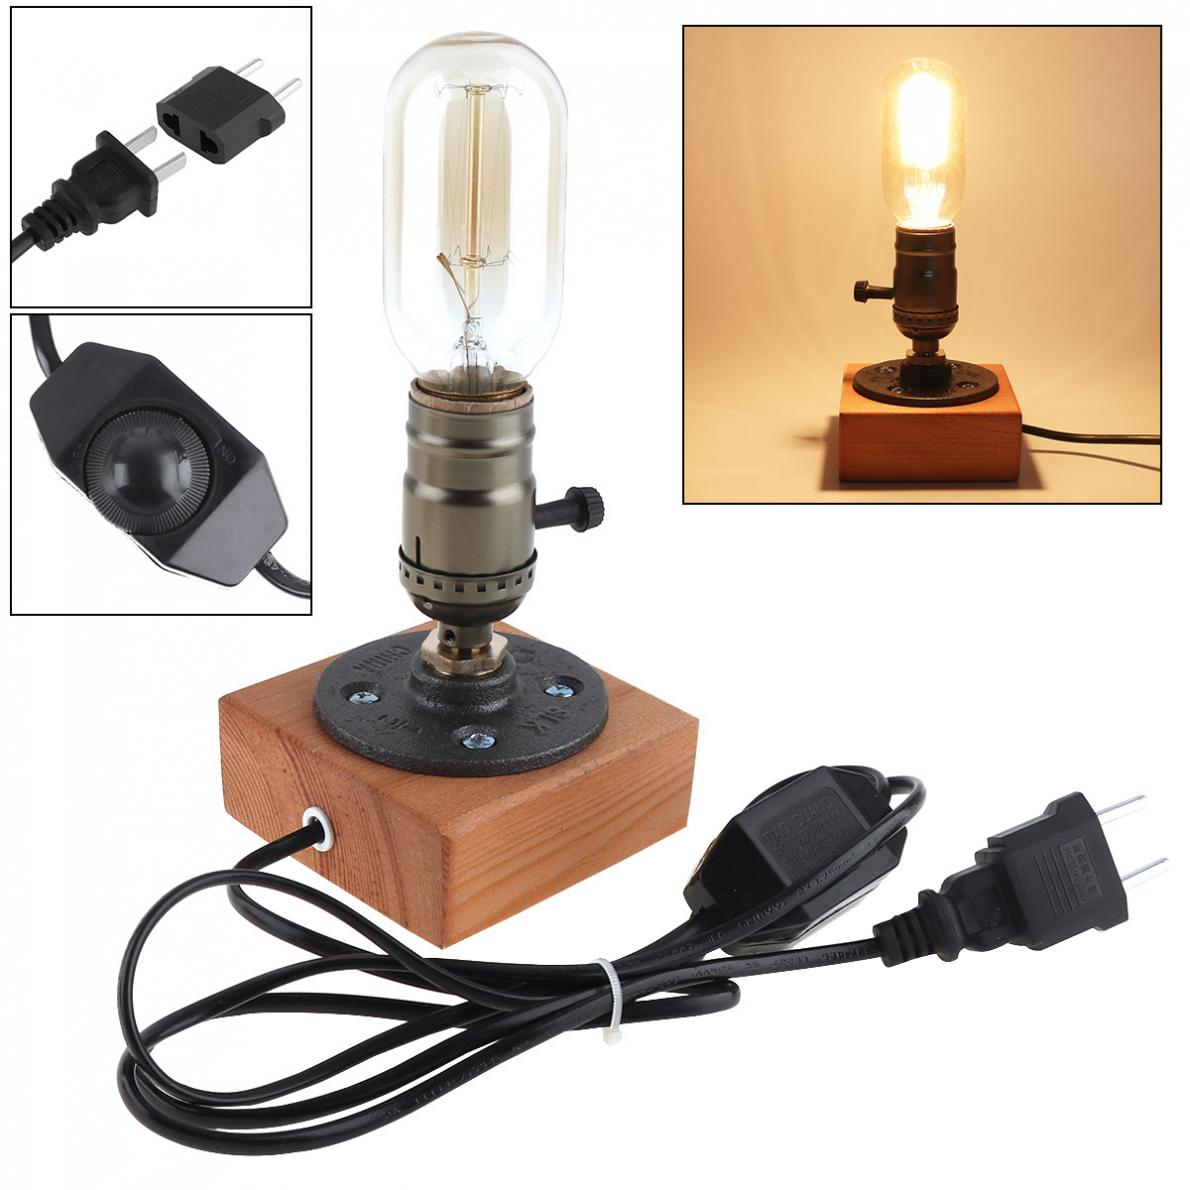 Retro Style Vintage Industrial Single Socket Table Bedside Desk Lamp Wooden Base Creative Edison Light Bulb